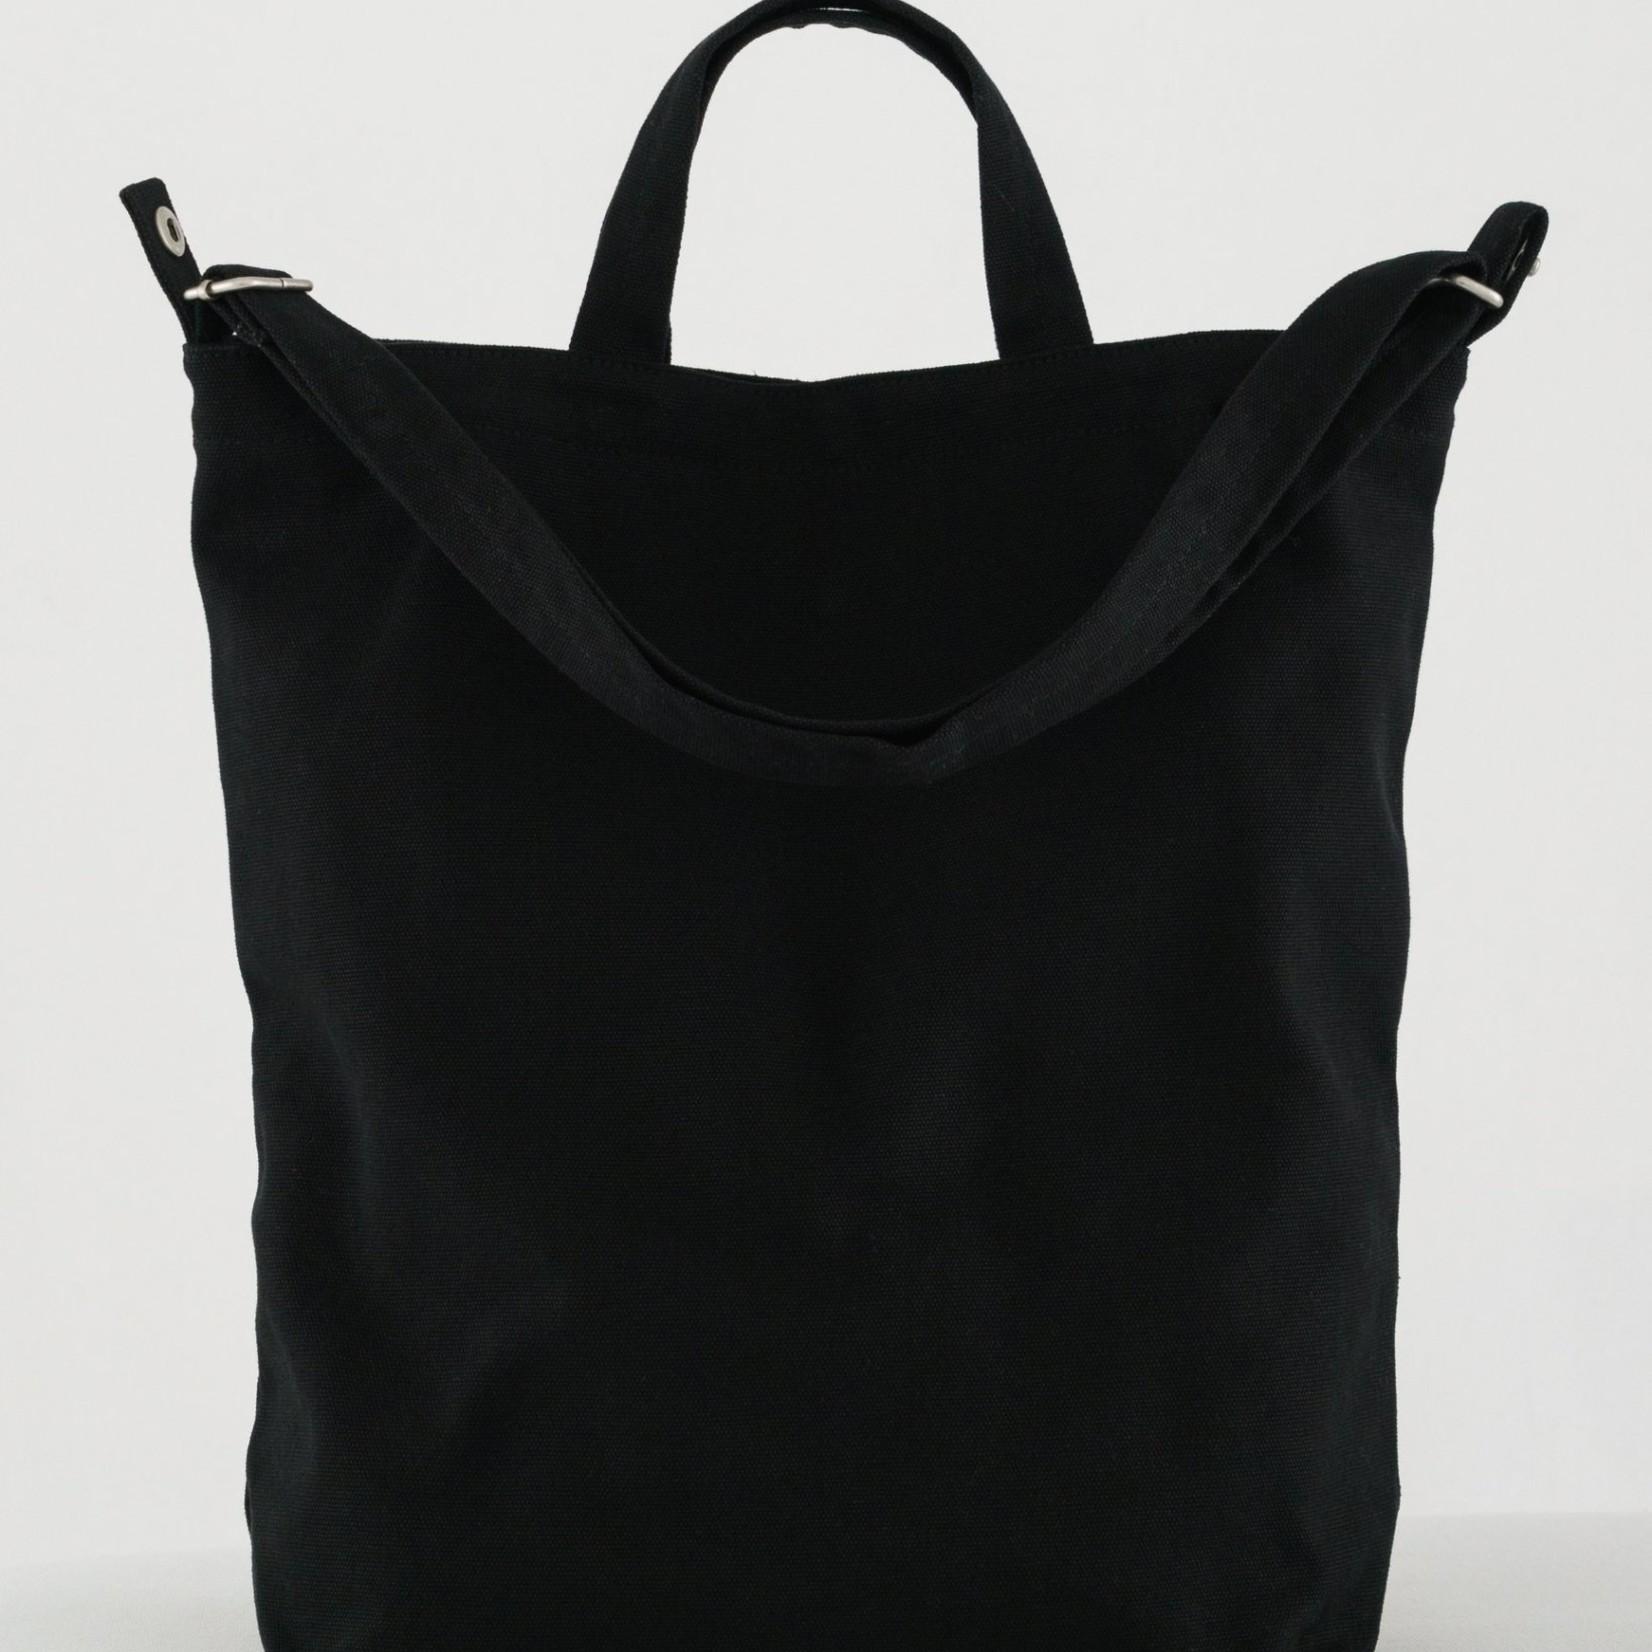 Baggu Baggu Canvas Duck Bag Black